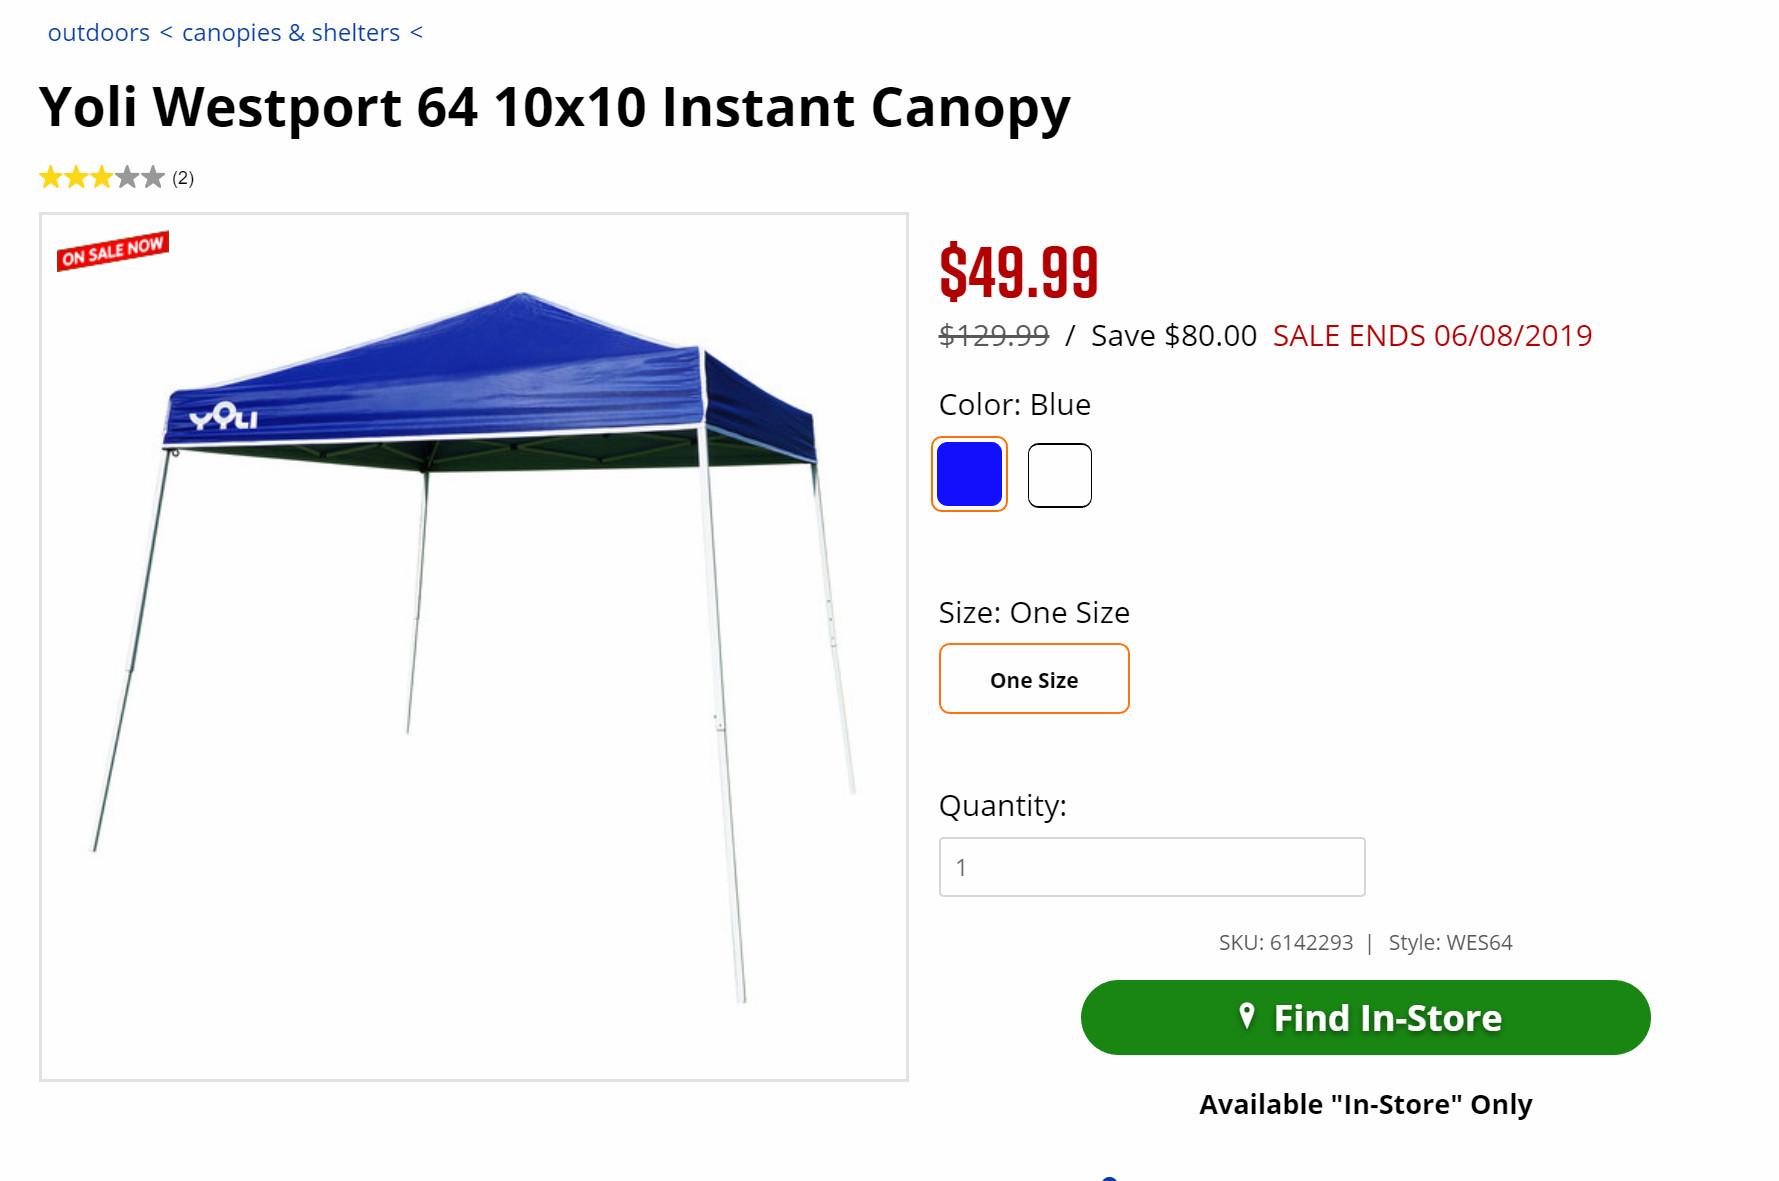 Yoli Westport 64 10x10 Instant Canopy $49 95 - Slickdeals net